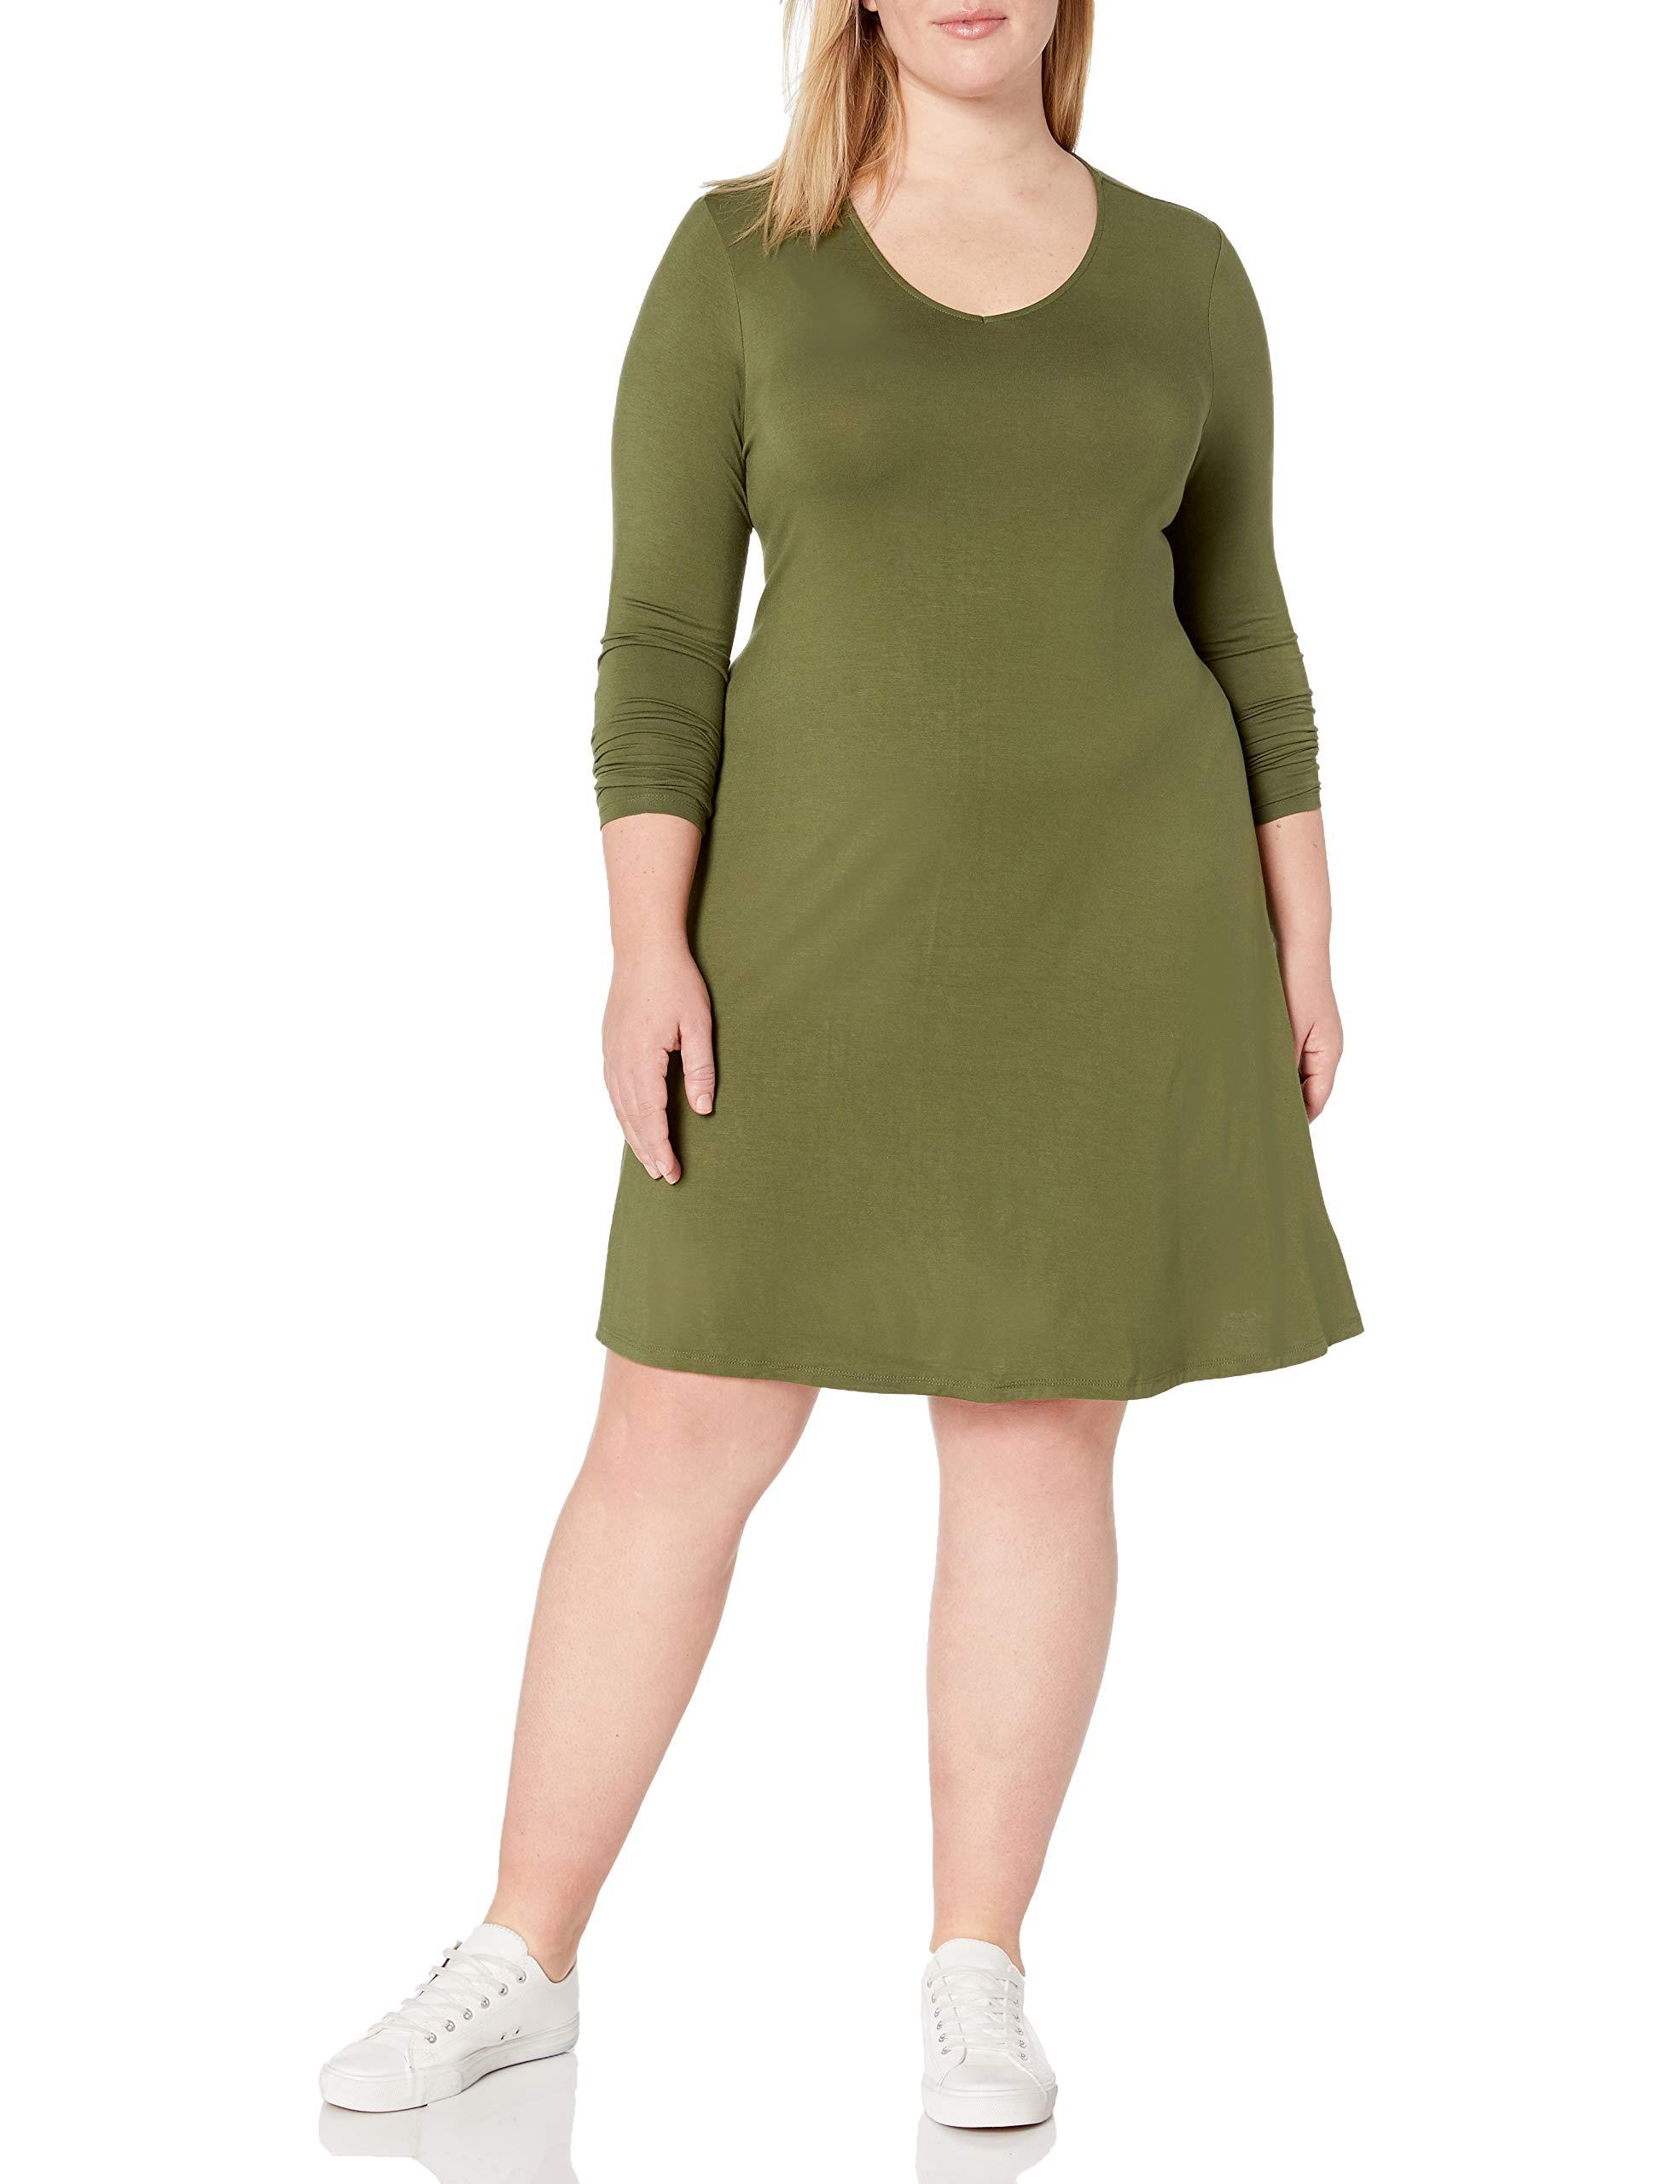 Amazon Brand - Daily Ritual Women's Plus Size Jersey Long-Sleeve V-Neck Dress